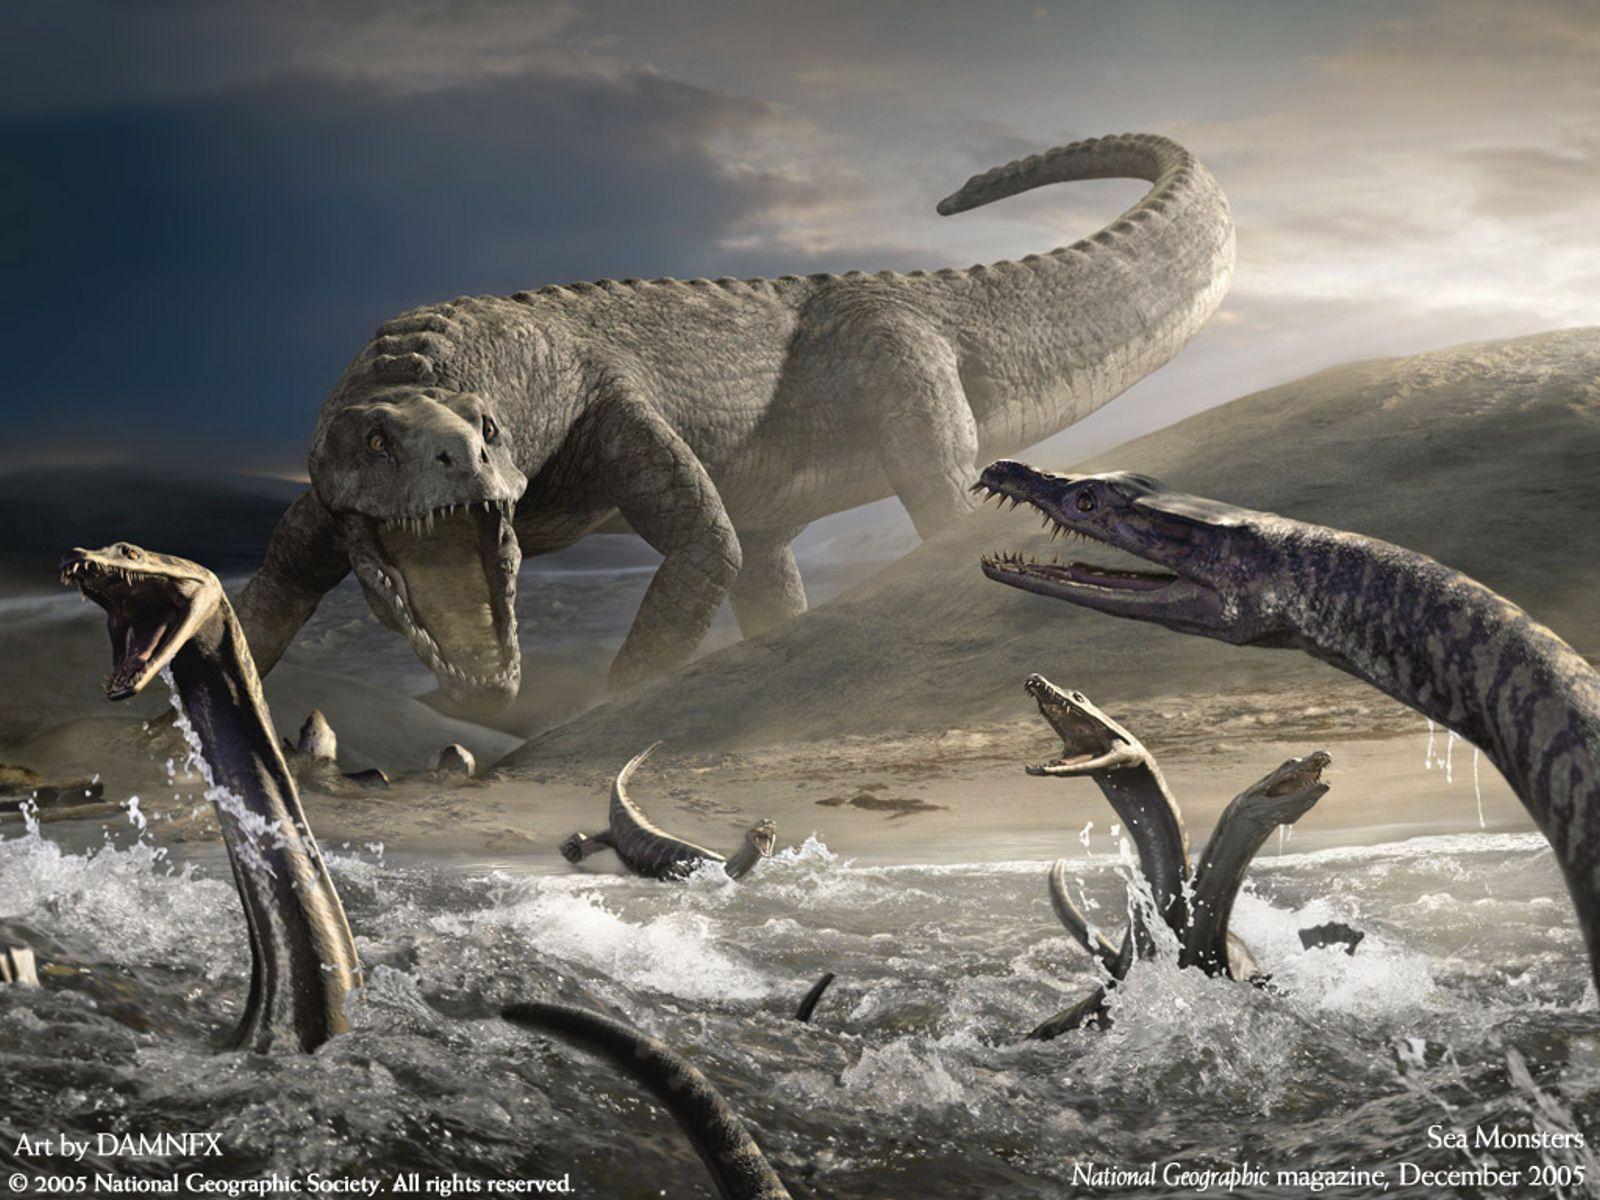 Sea Monsters Fantasy Creatures Wallpaper Image 1600x1200PX